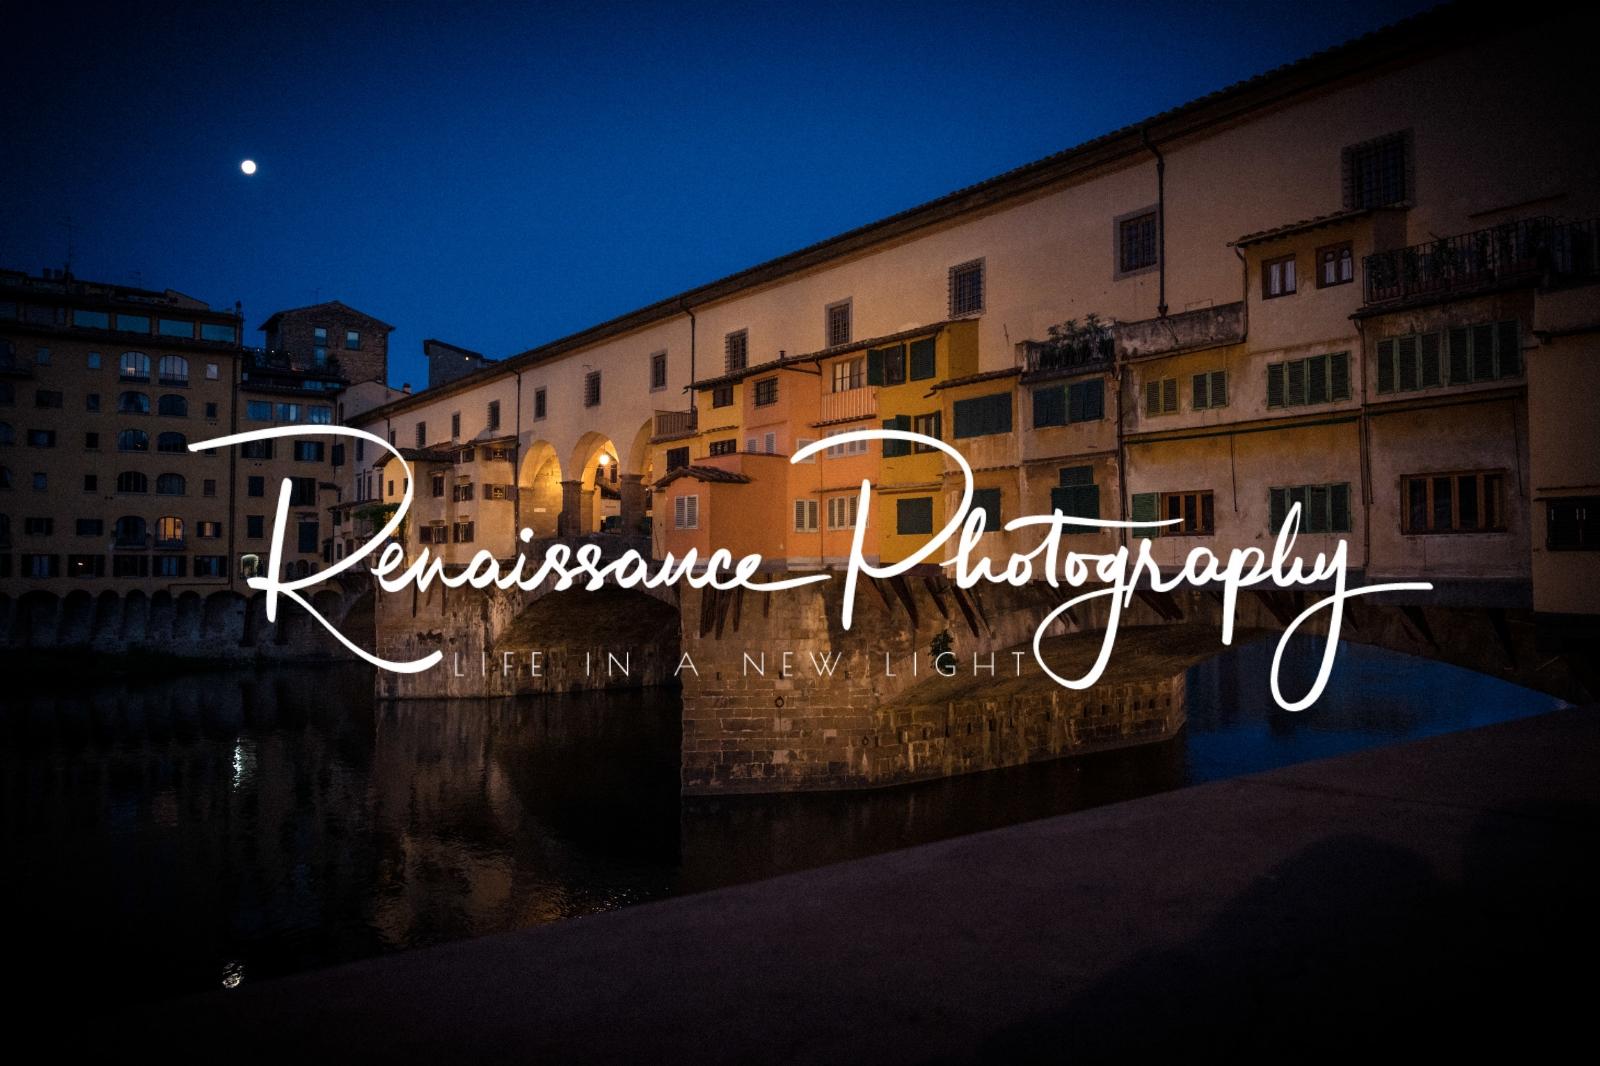 Renaissance Photography, LLC  PO Box 2548 Rancho Mirage, CA  Tel. +1 888-642-0481 E. chris@docnikon.com